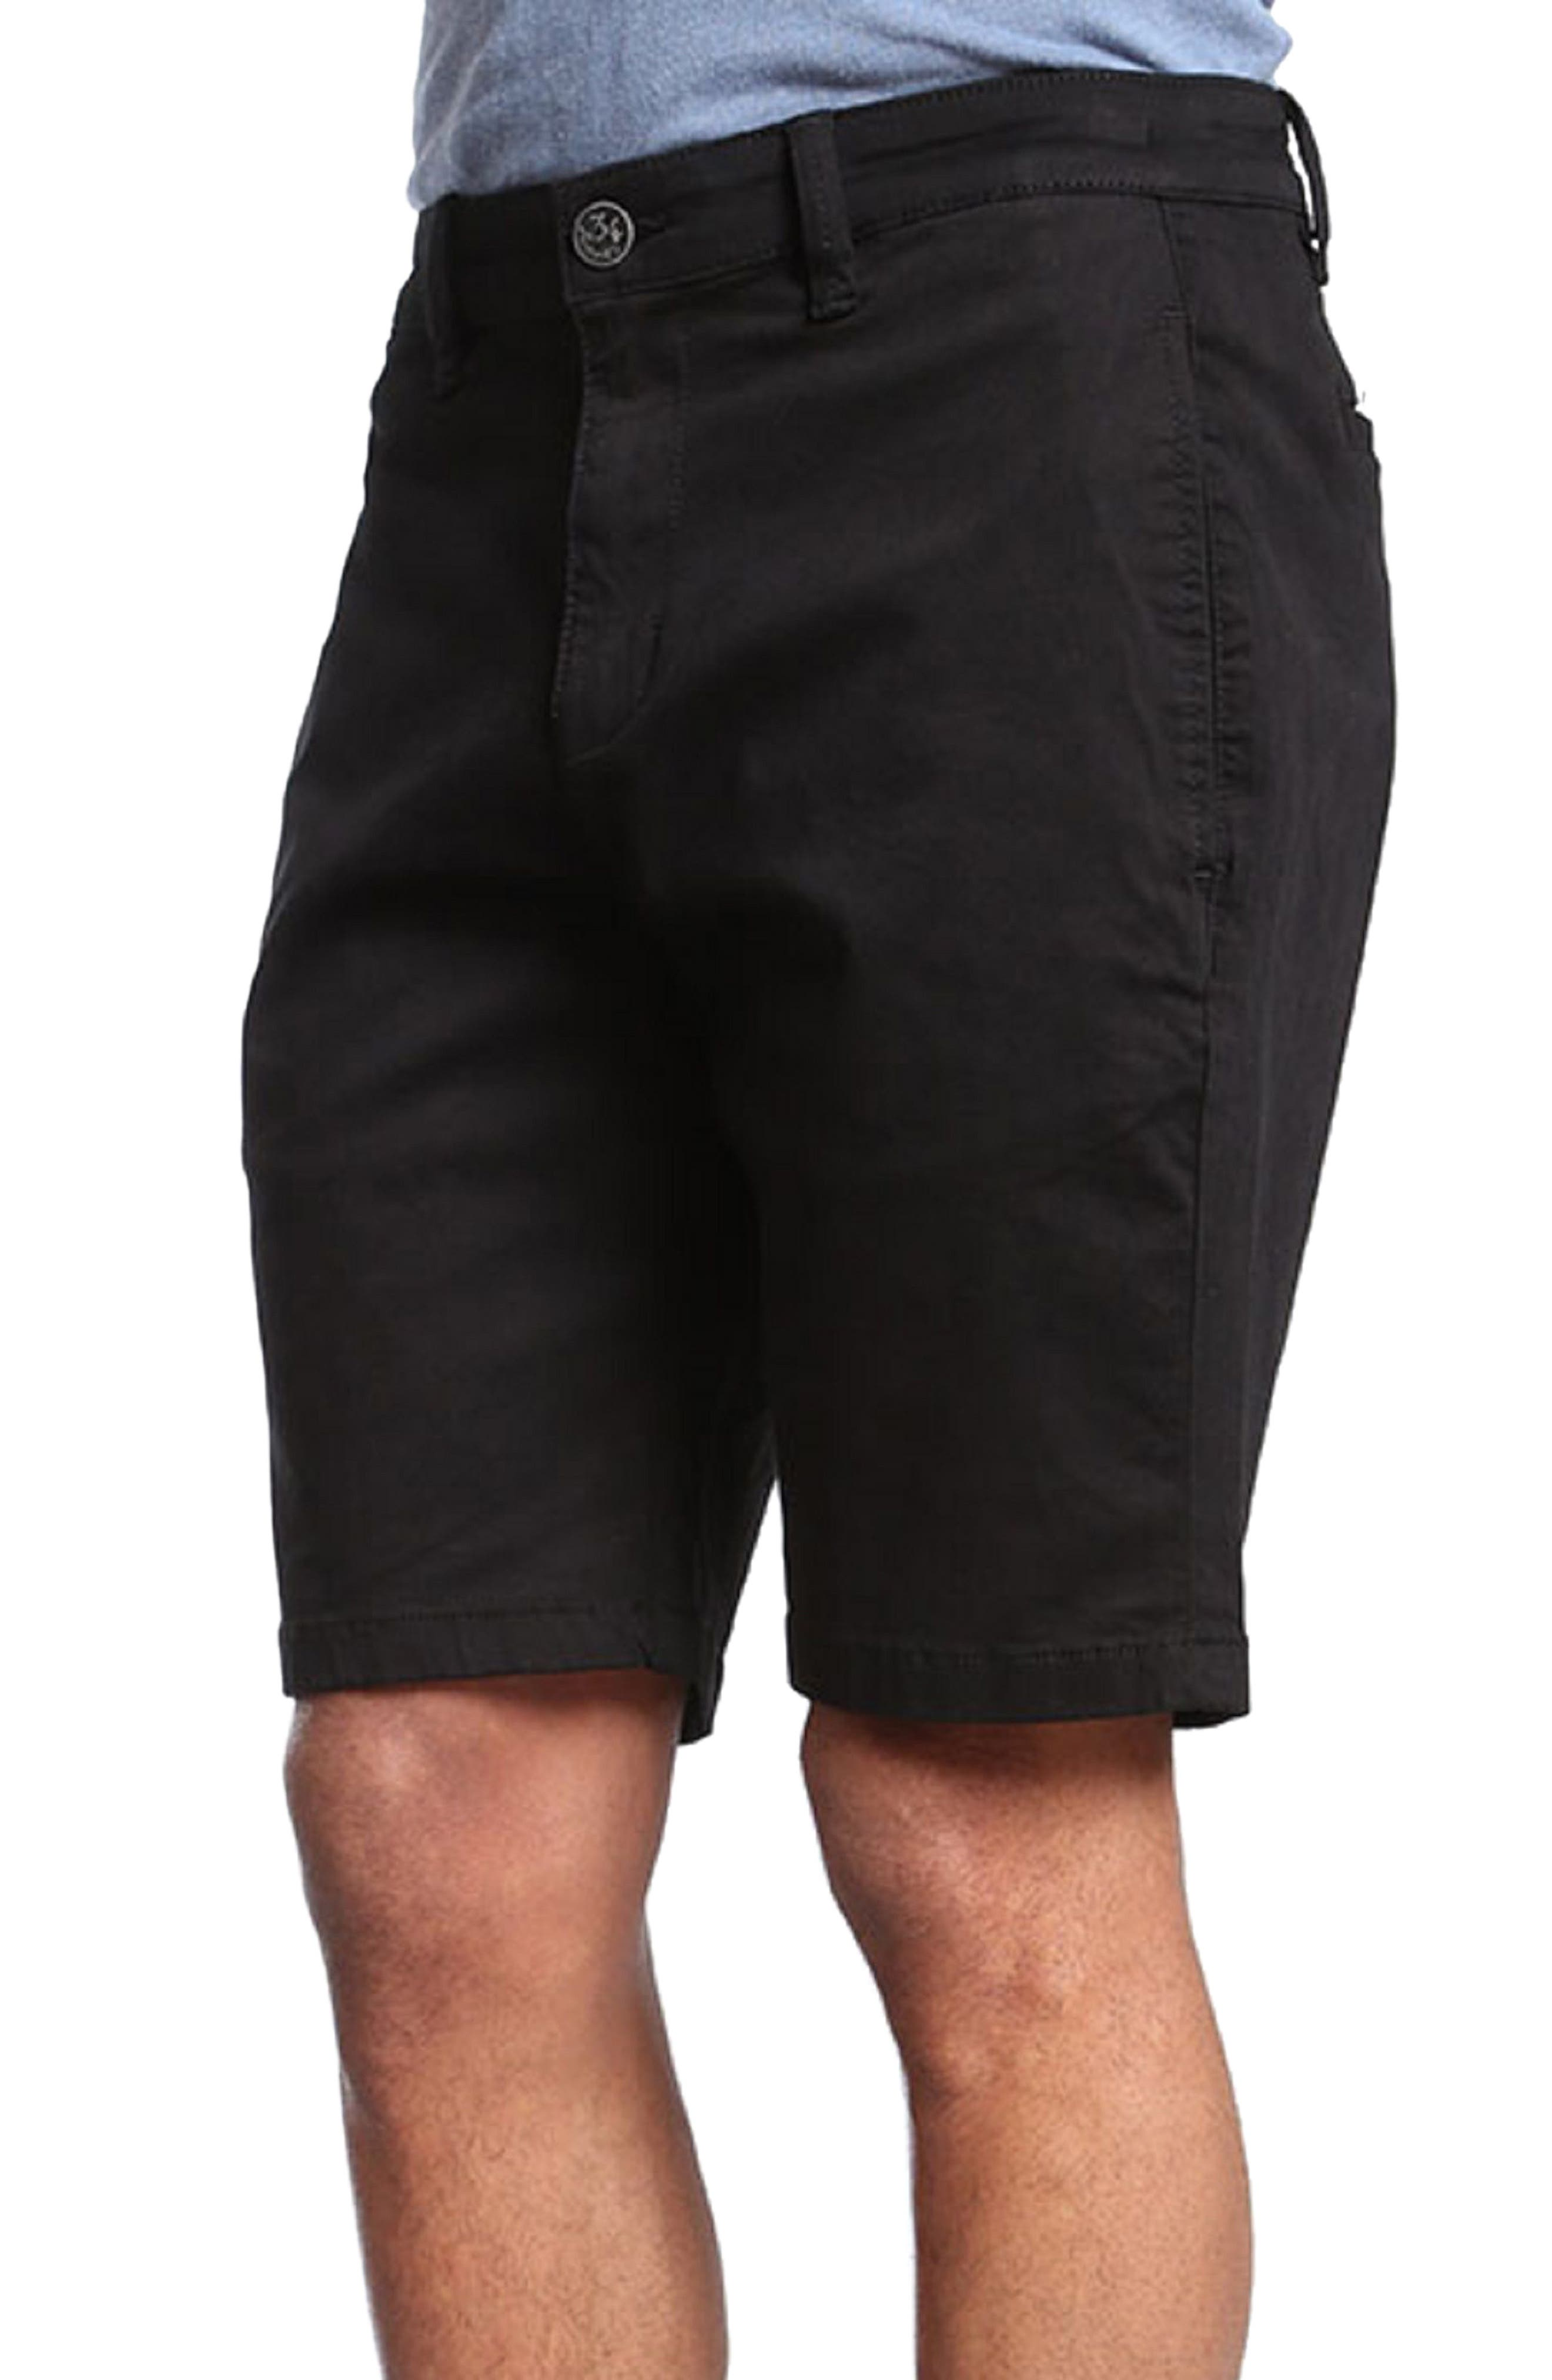 Nevada Twill Shorts,                             Main thumbnail 1, color,                             BLACK TWILL